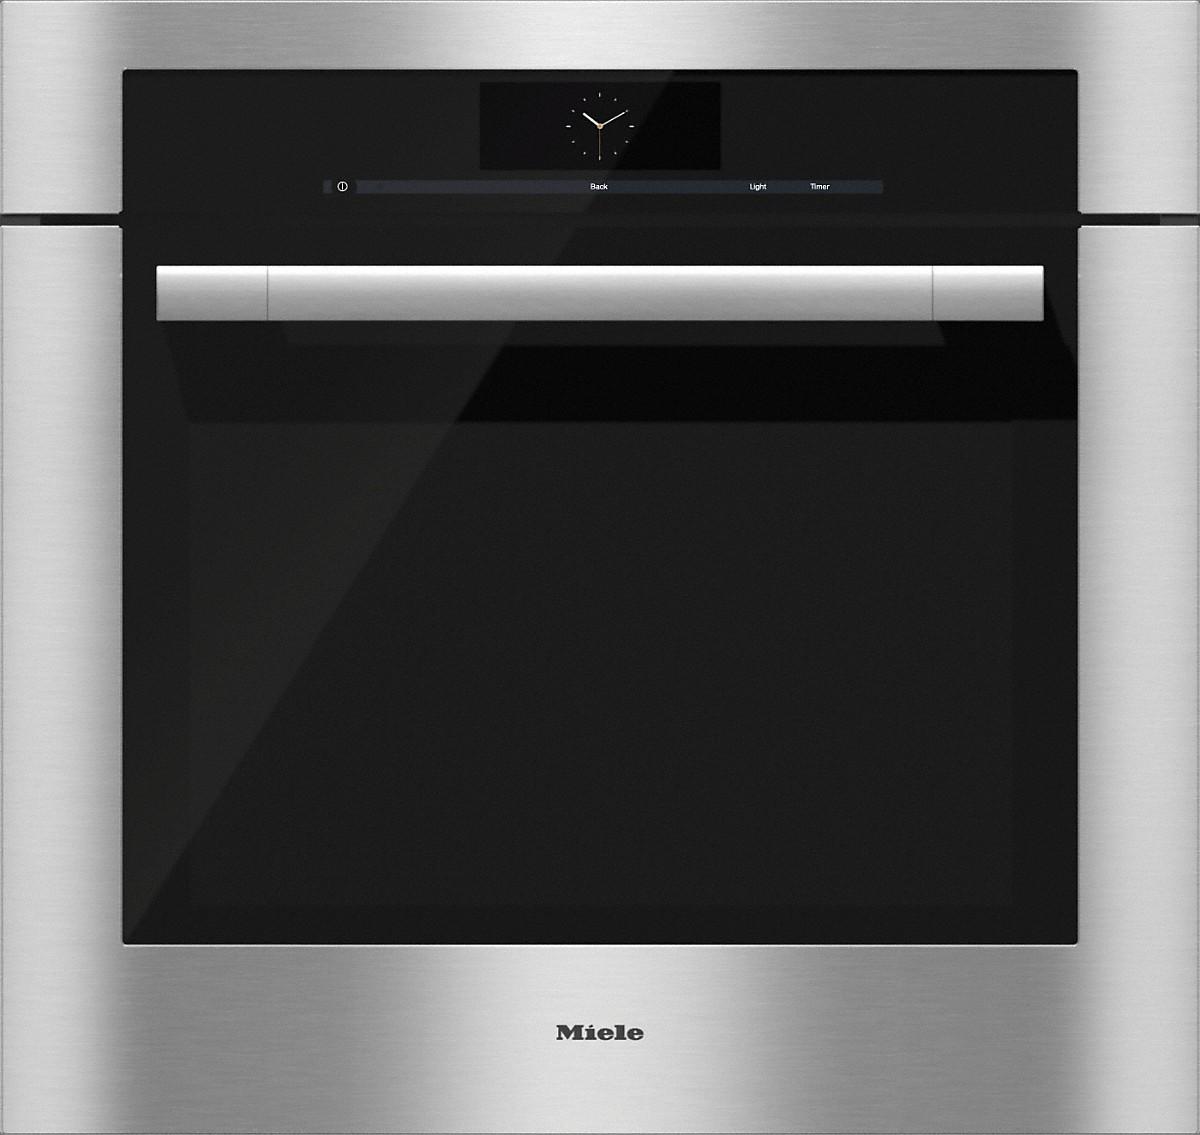 "Miele 30"" Single Wall Oven           H 6780-2 BP"